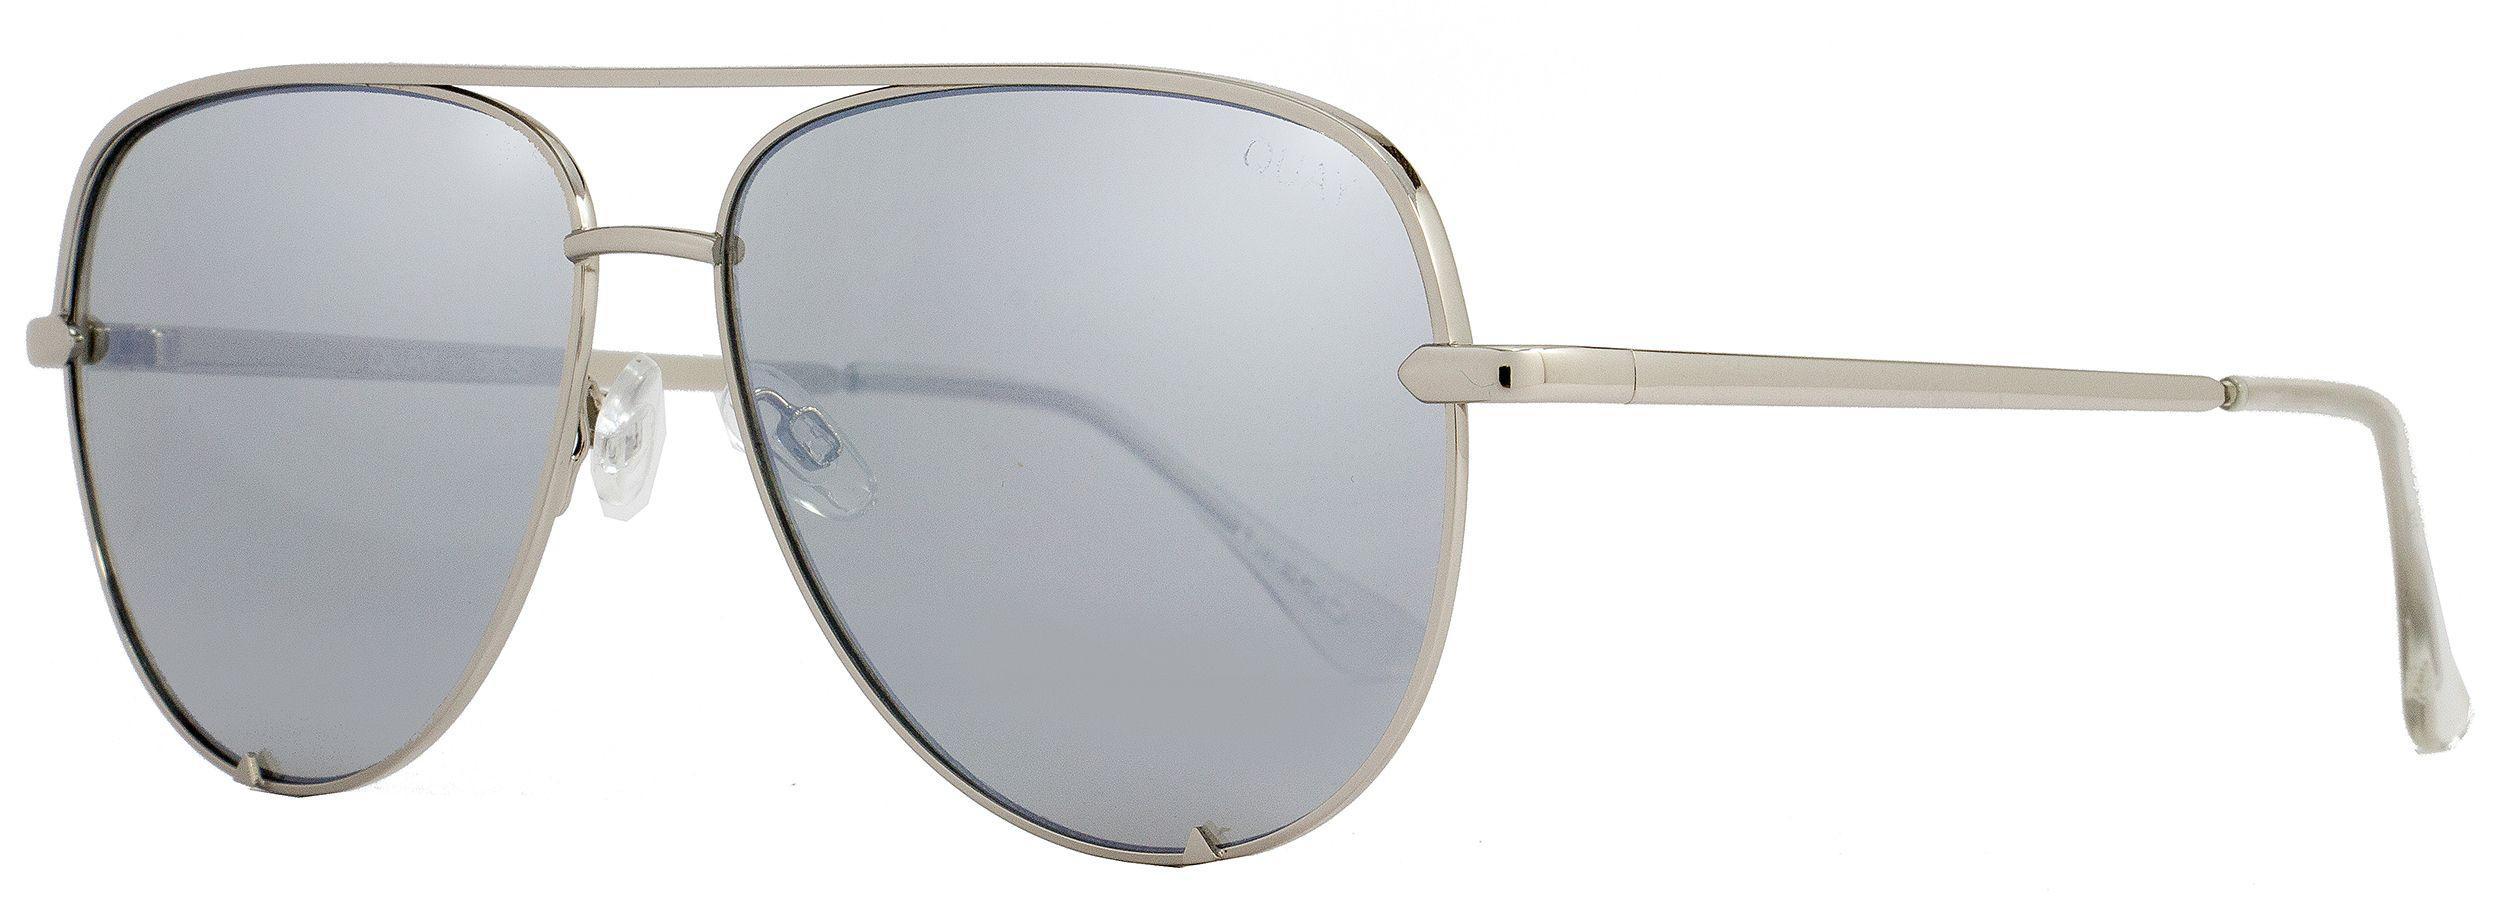 f04f2ac98d3d7 Lyst - Quay Aviator Sunglasses Qw000142 High Key Slv-slv Silver 142 ...